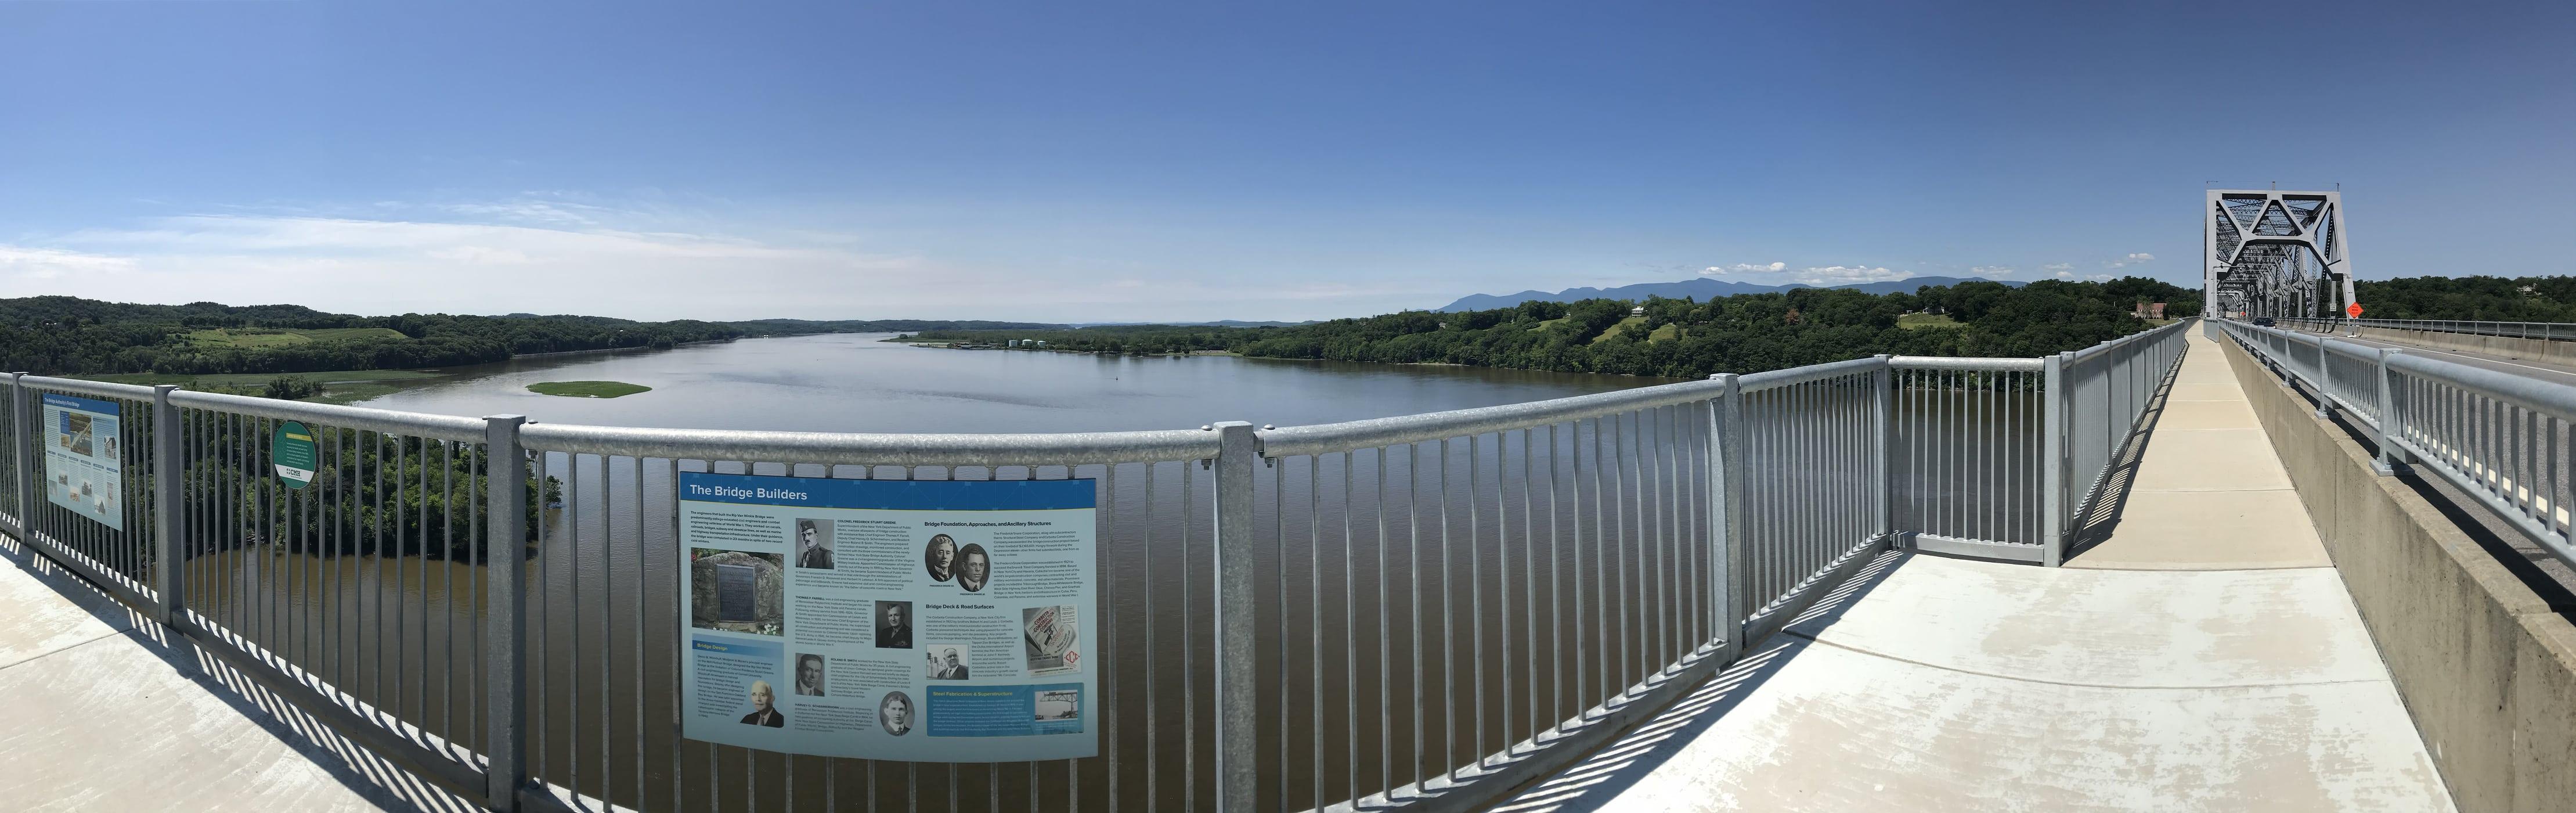 Hudson River SkyWalk